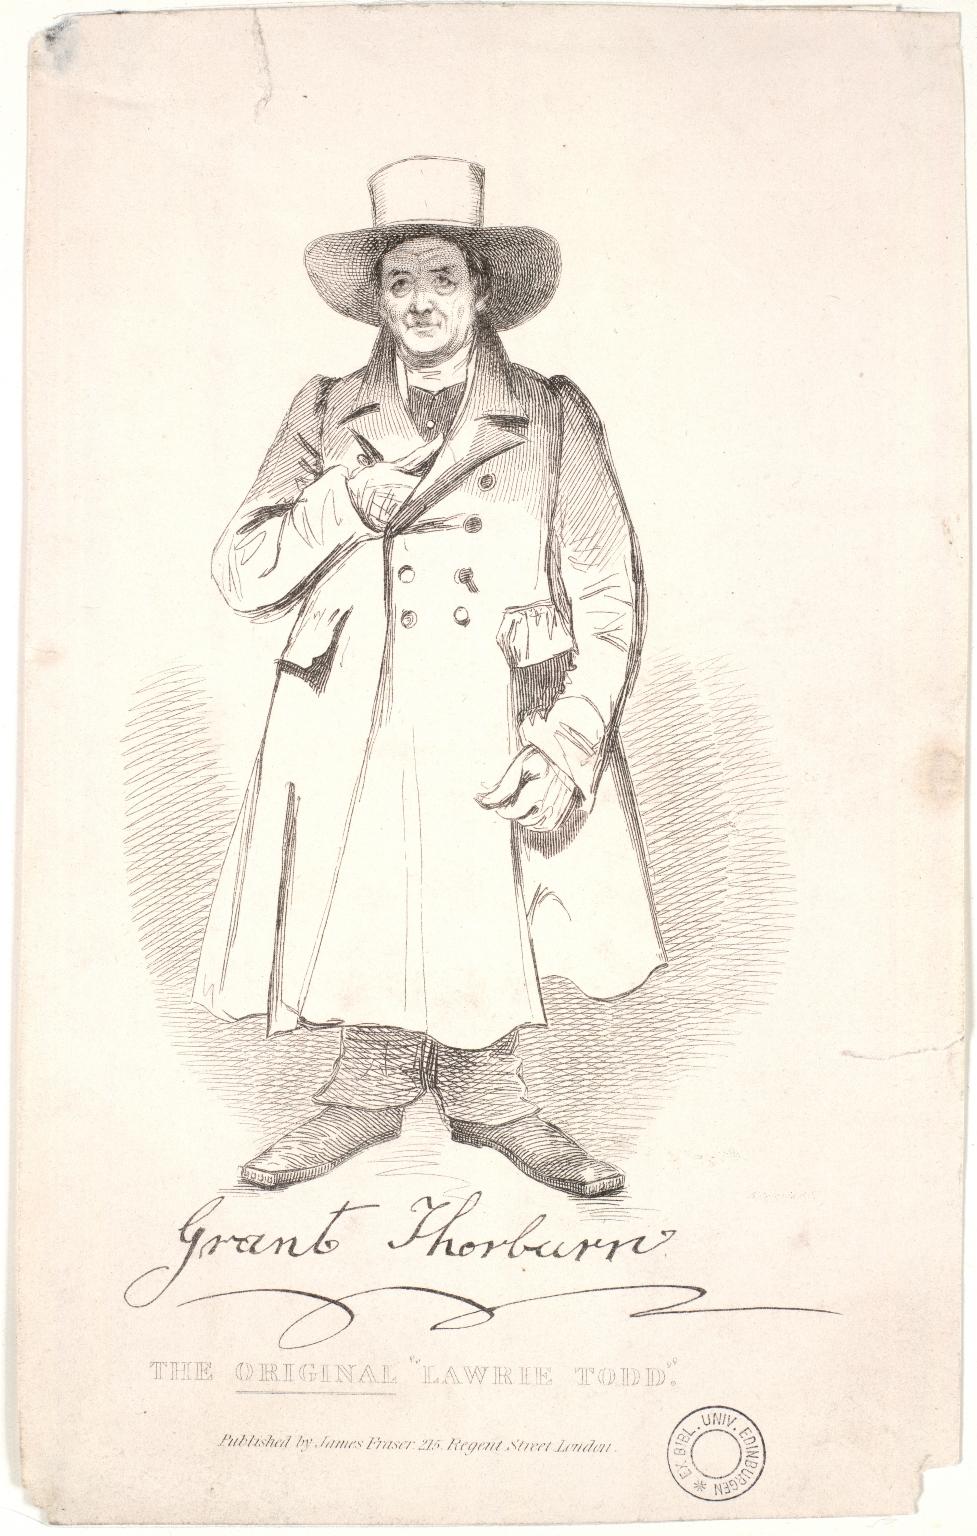 Thorburn, Grant, 1773-1863 (I assume)